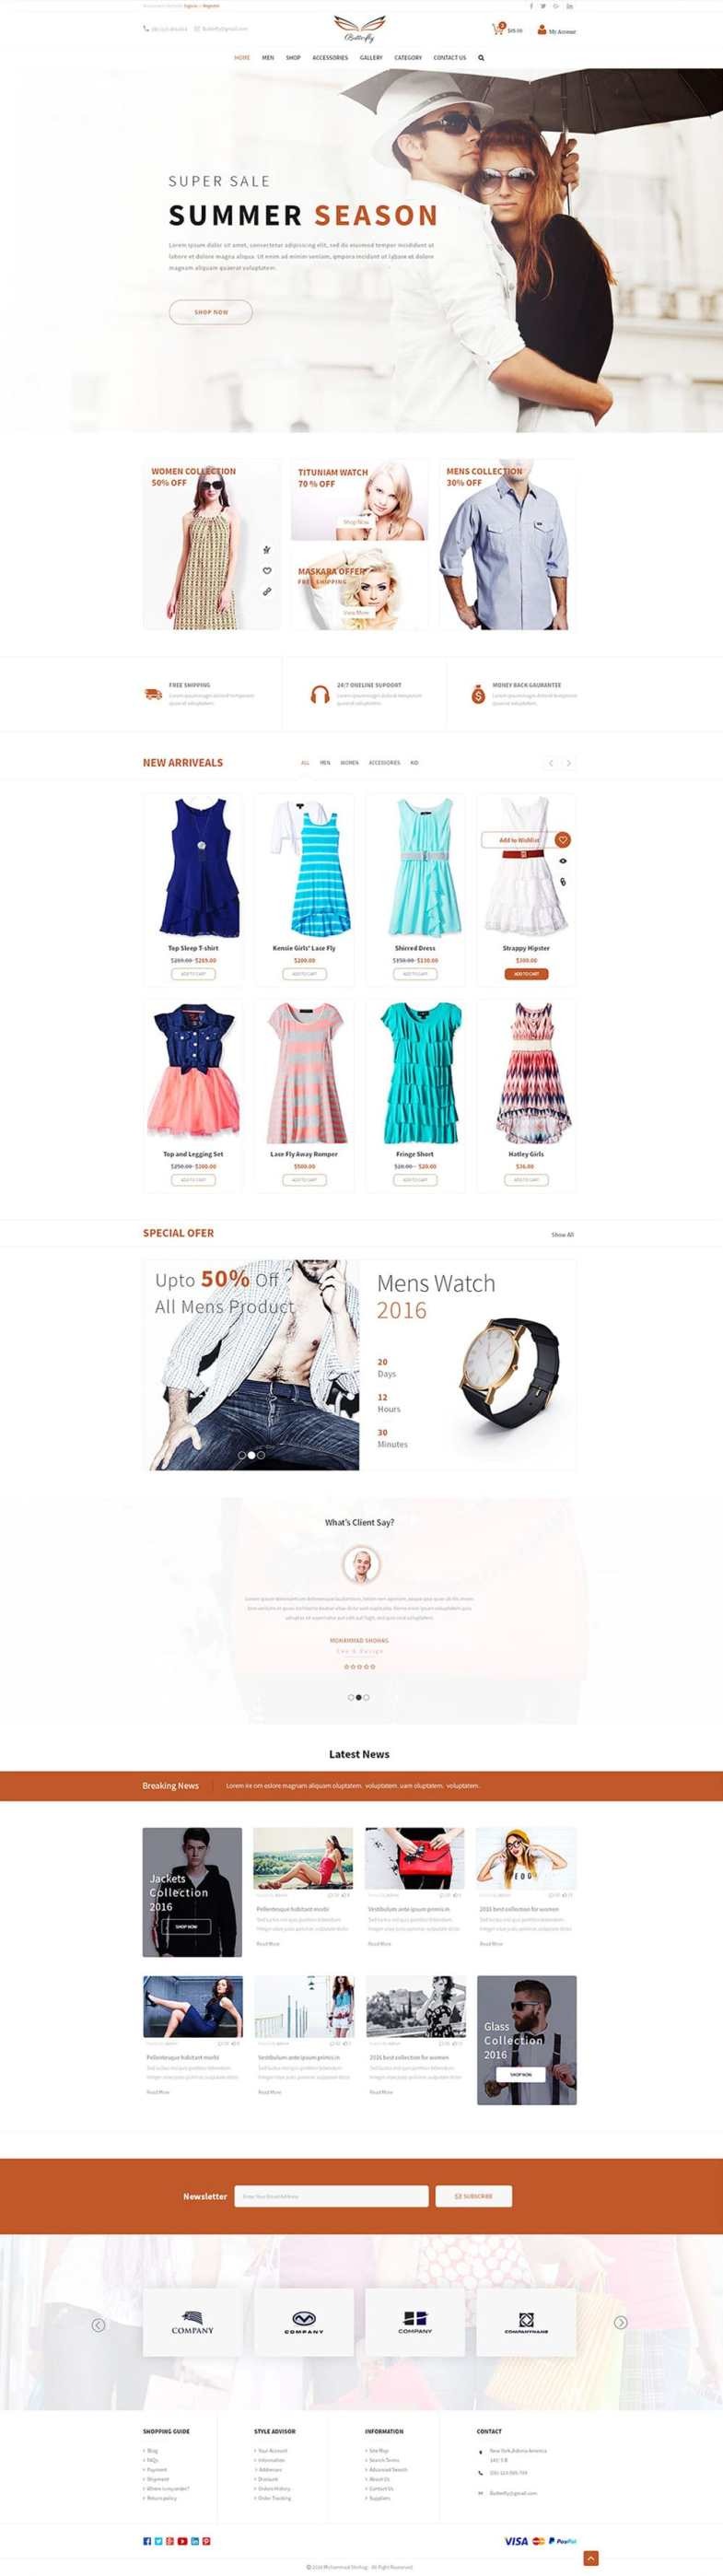 Free Fashion E commerce Template PSD Бесплатные шаблоны для интернет-магазина psd - Free Fashion E commerce Template PSD - Бесплатные шаблоны для интернет-магазина PSD